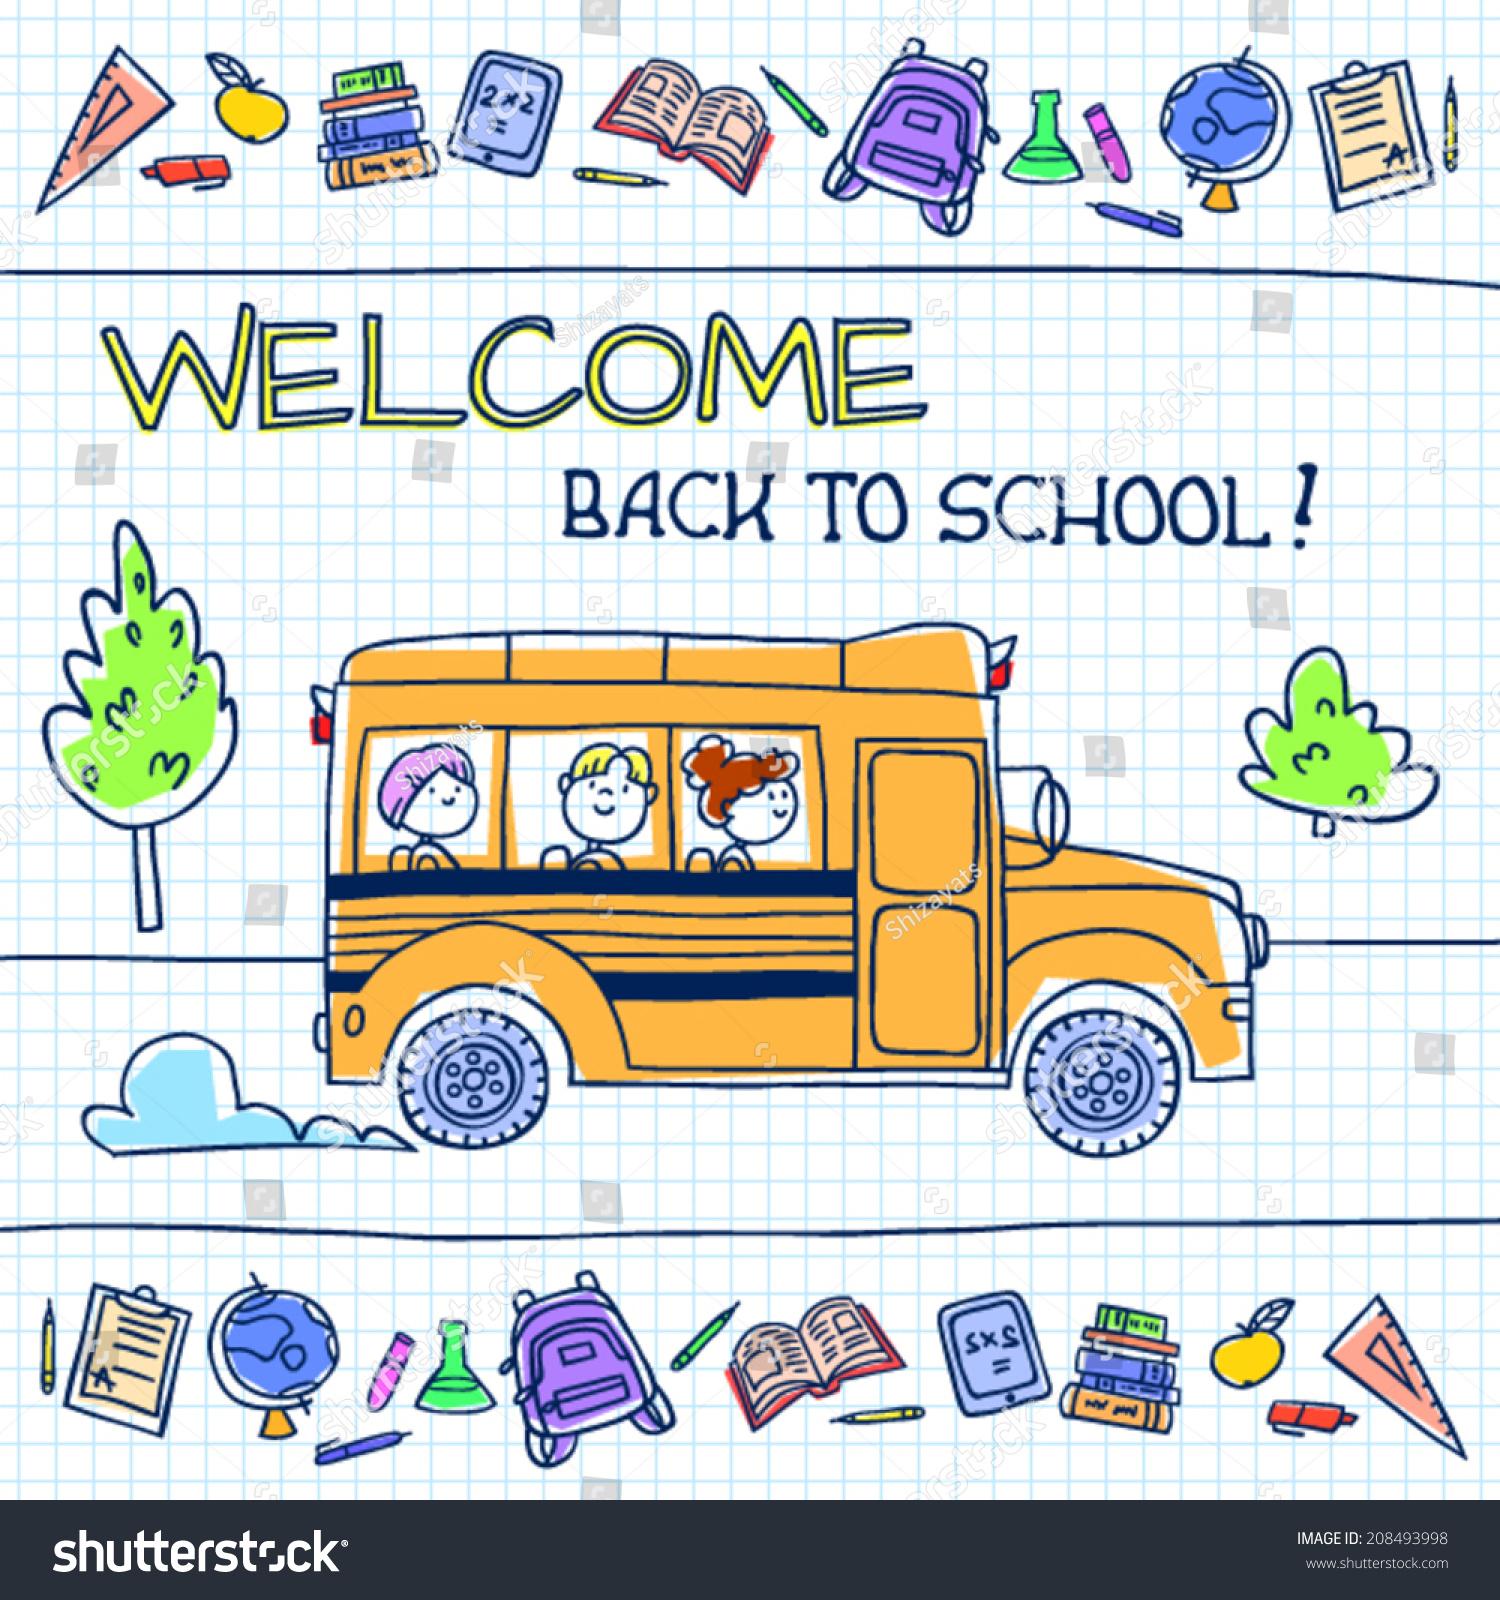 Children Riding School Bus Vector Illustration เวกเตอร์สต็อก